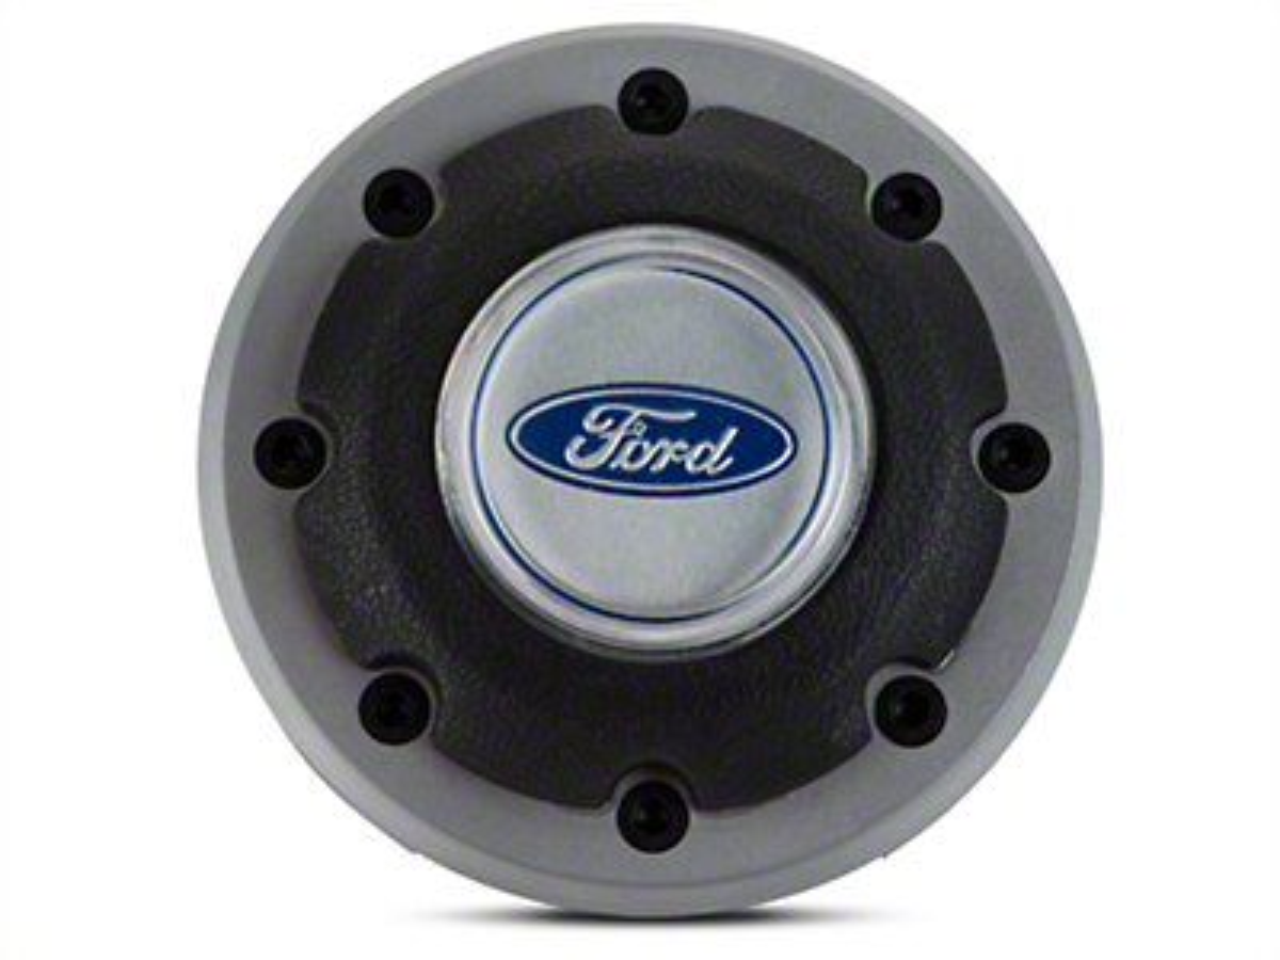 OPR Horn Button Assembly for 3-Spoke Sport Wheel (79-82 All)